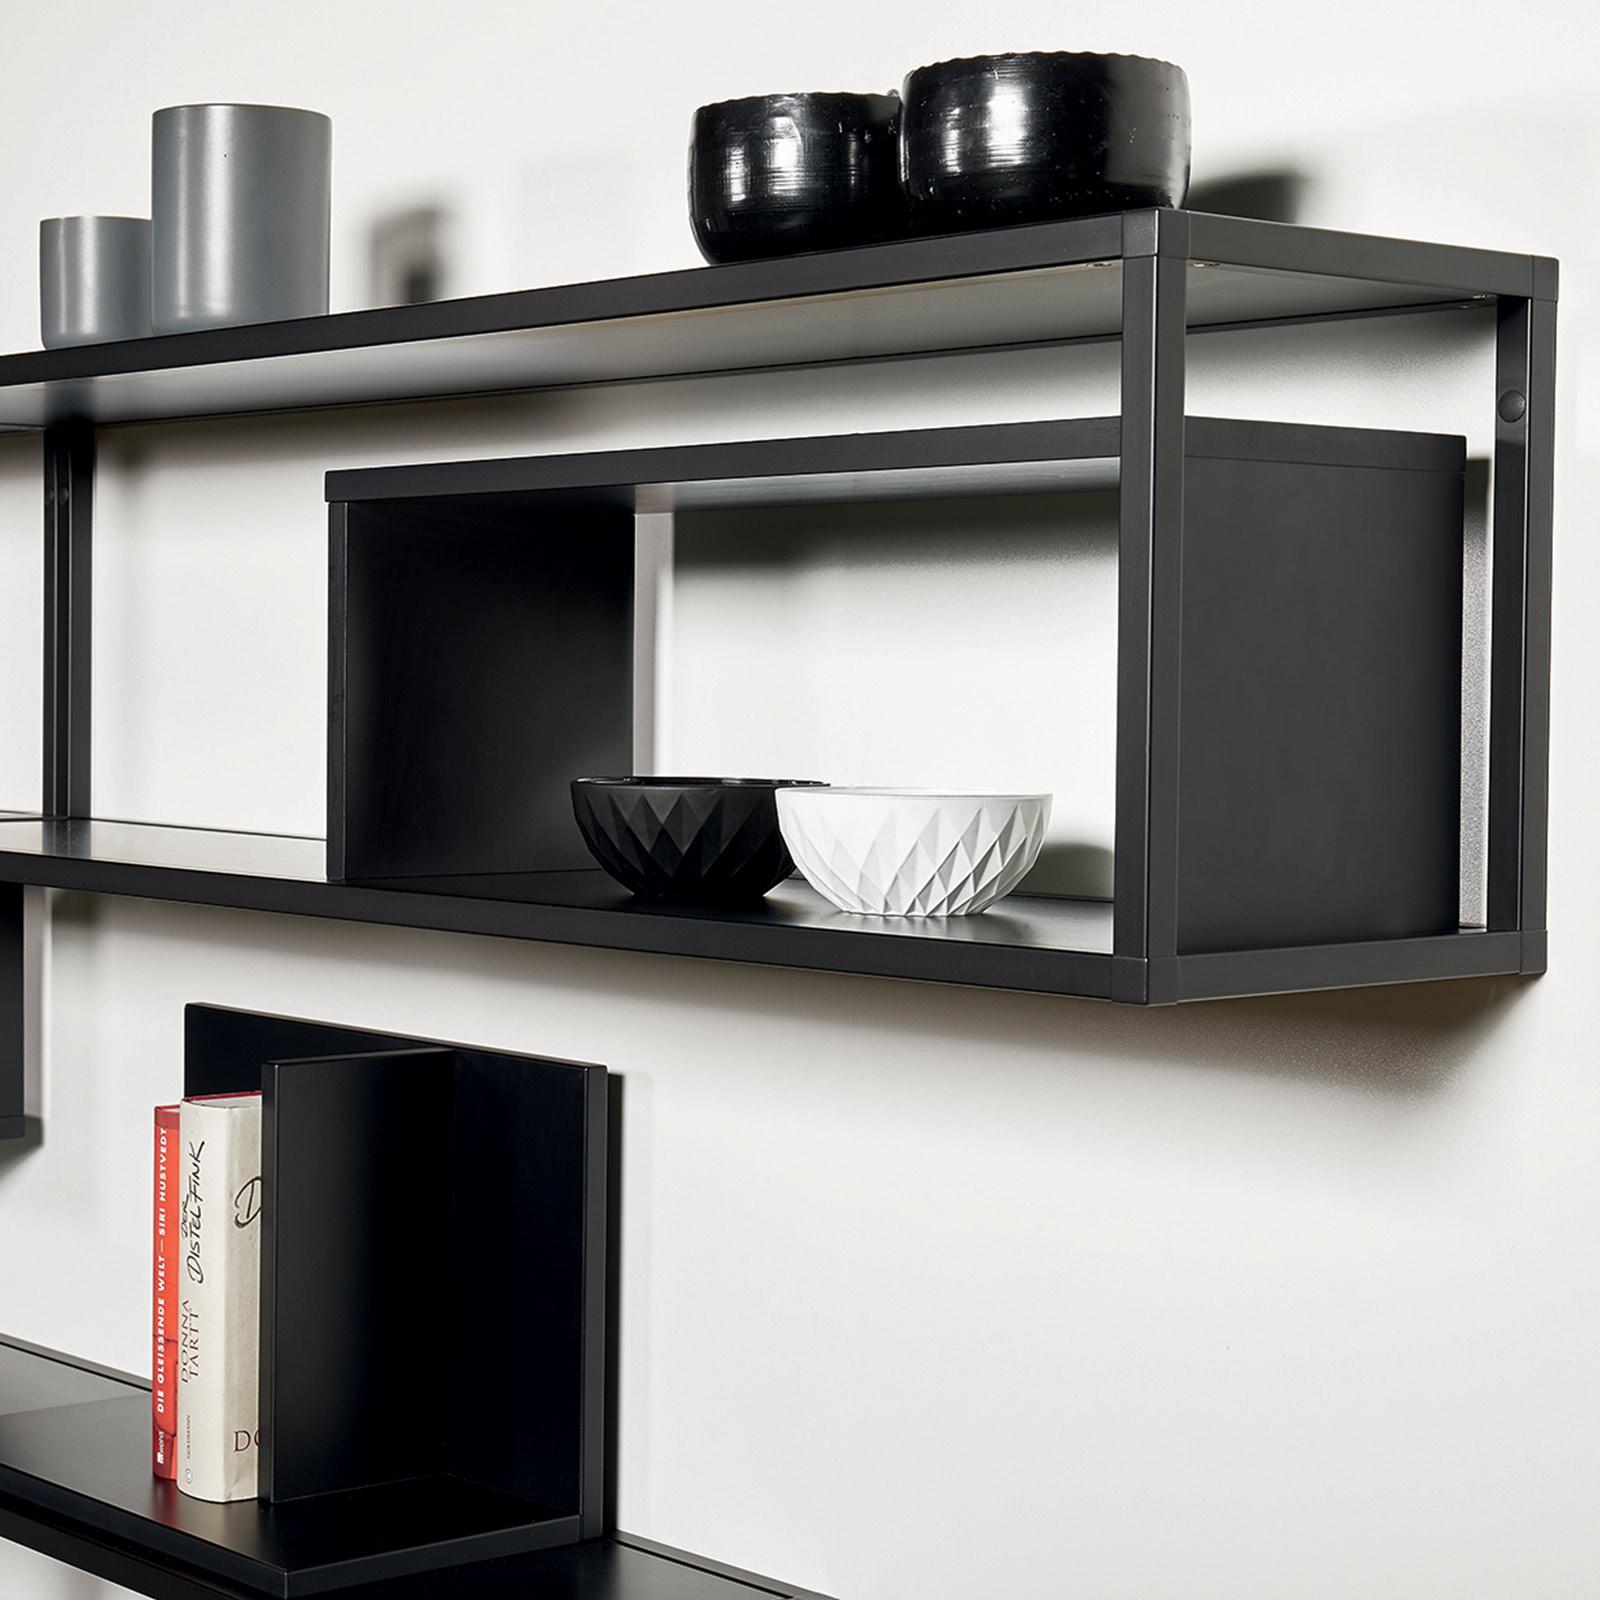 T20 Shelf Brackets Supports 32093